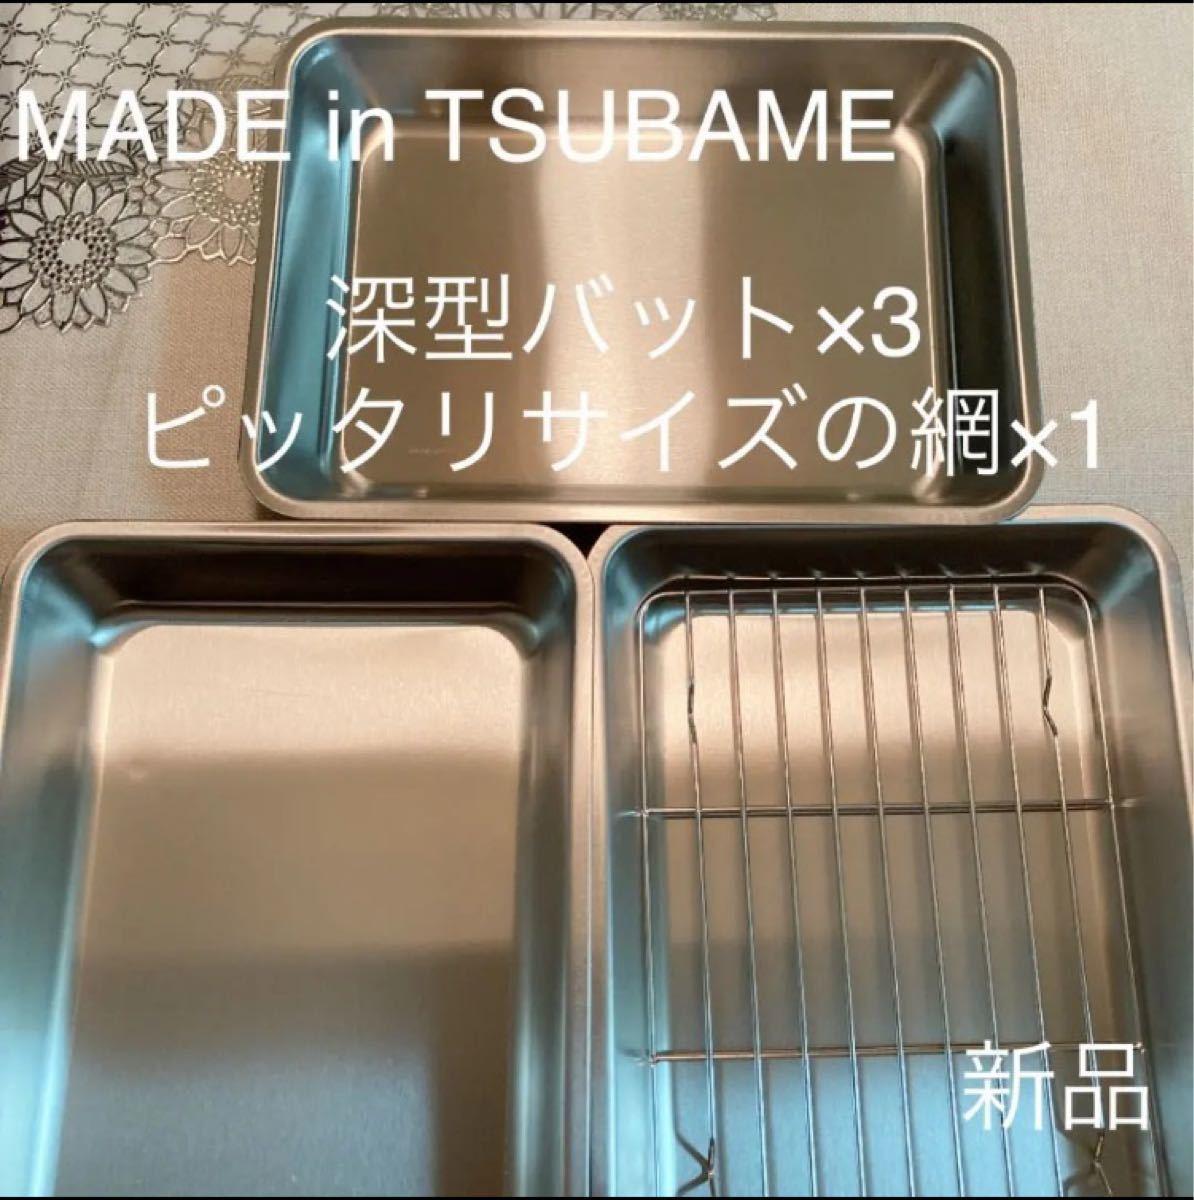 MADE in TSUBAME深型バット×2と網付きバット×1セット 新品 日本製 新潟県燕市燕三条 刻印入り ステンレスバット